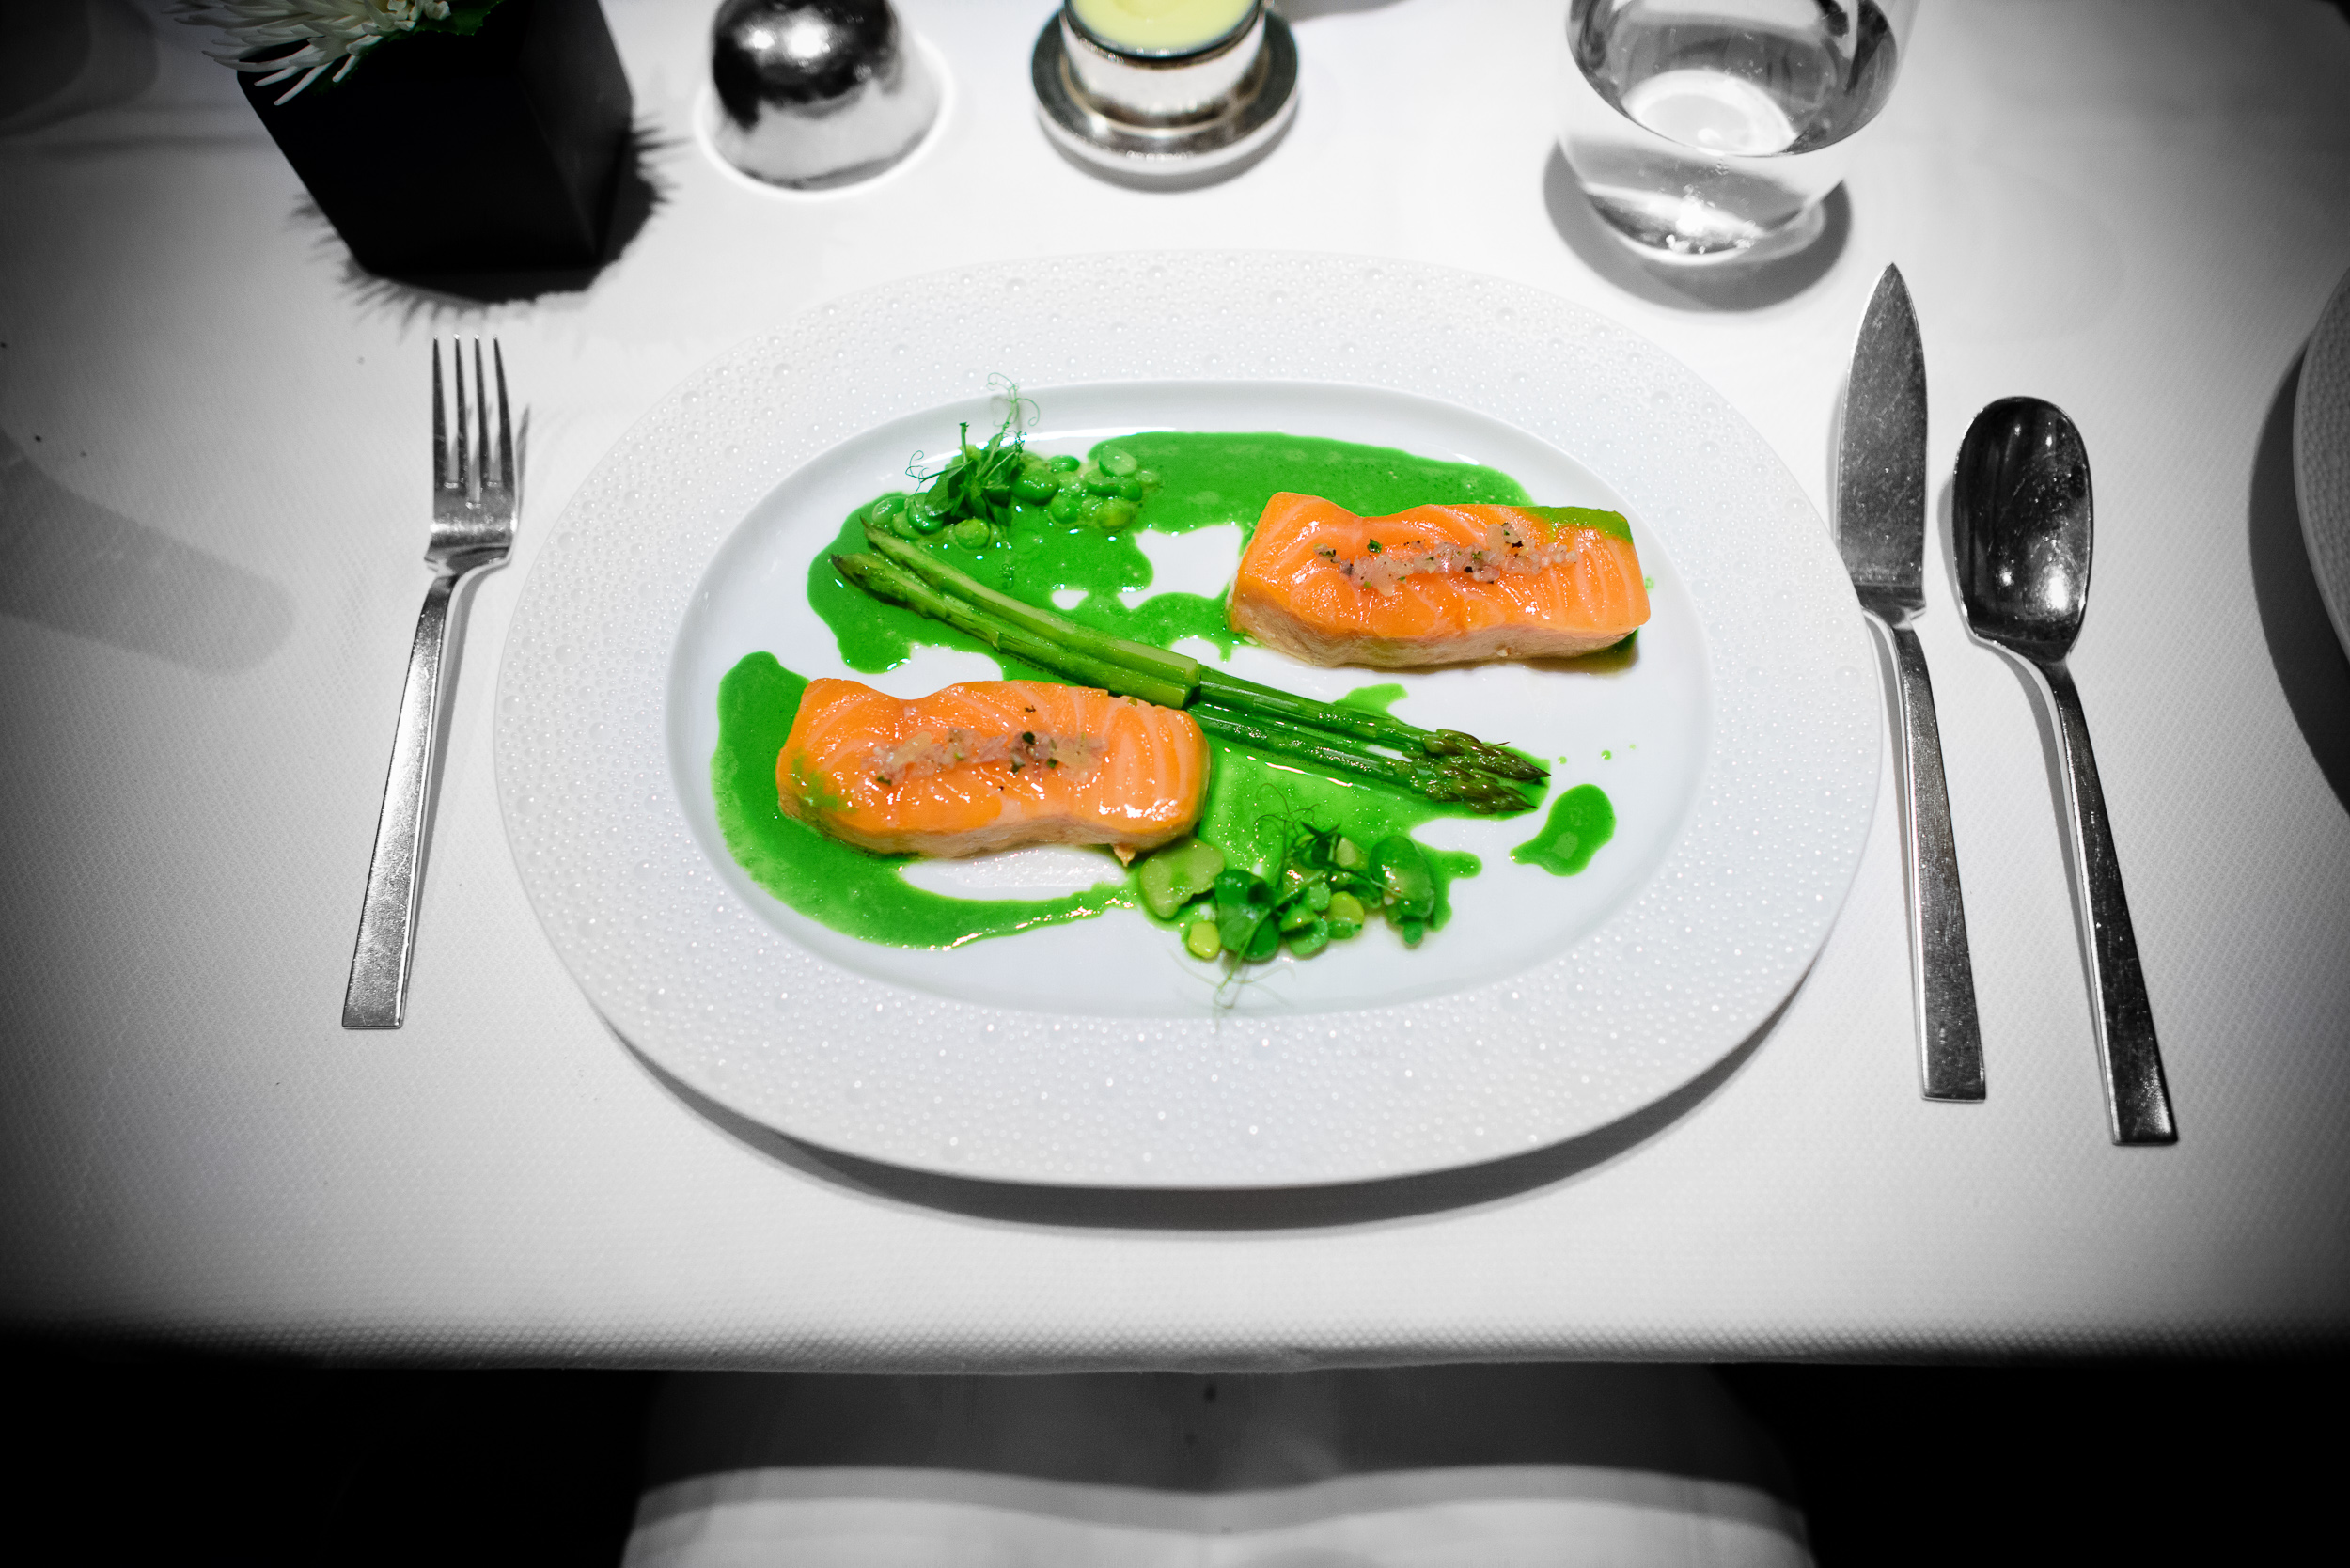 Salmon; barely cooked wild salmon, asparagus, peas and fava bean